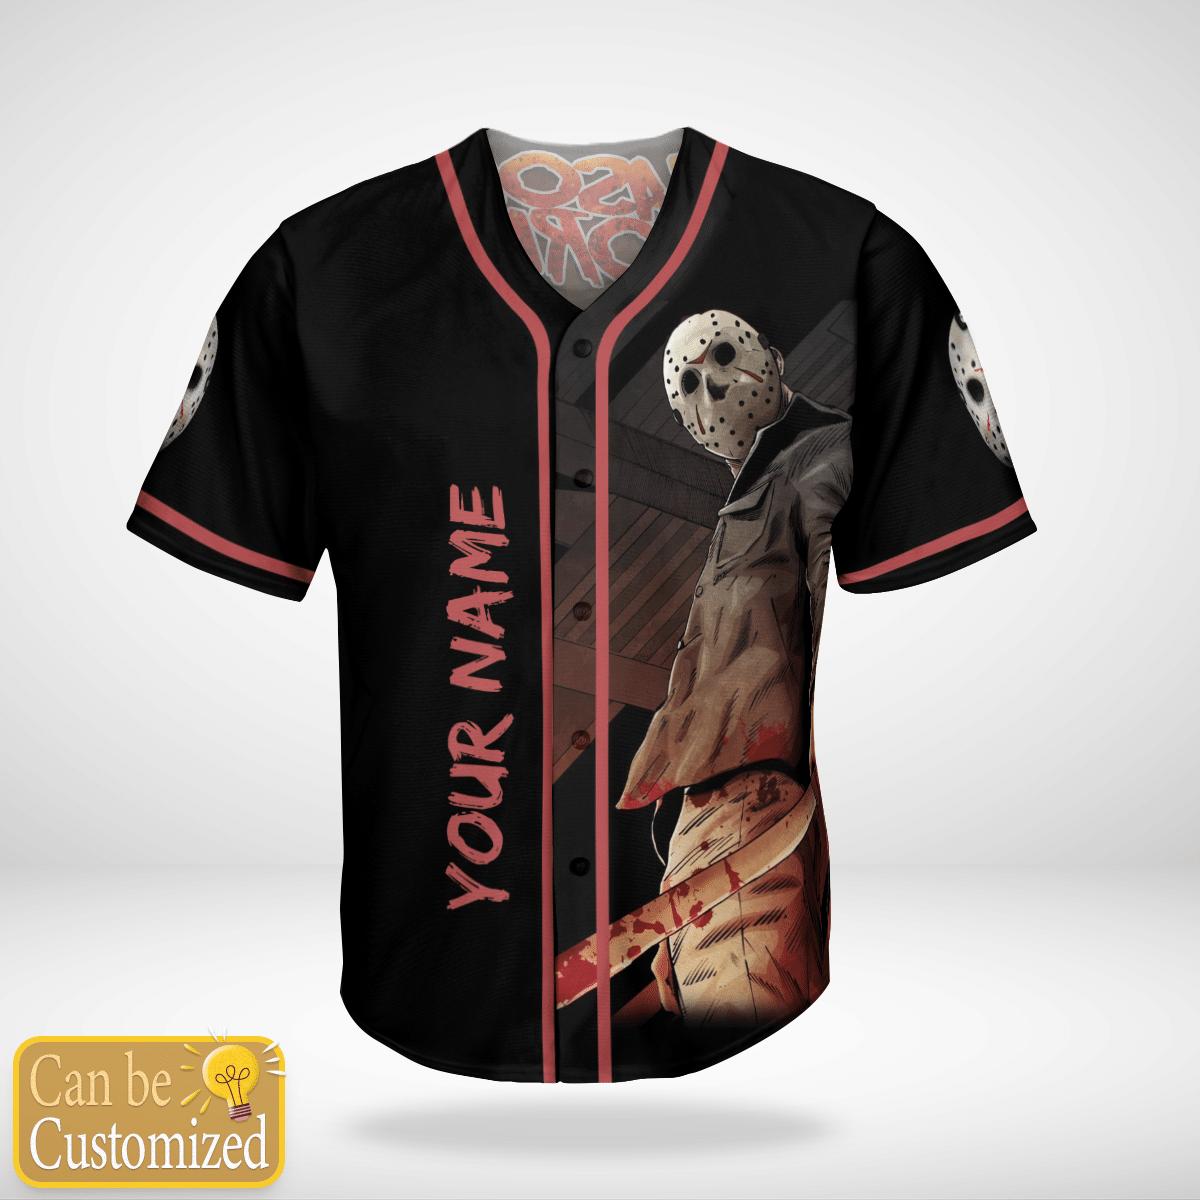 Personalized Jason Voorhees Friday 13th baseball Jersey Shirt